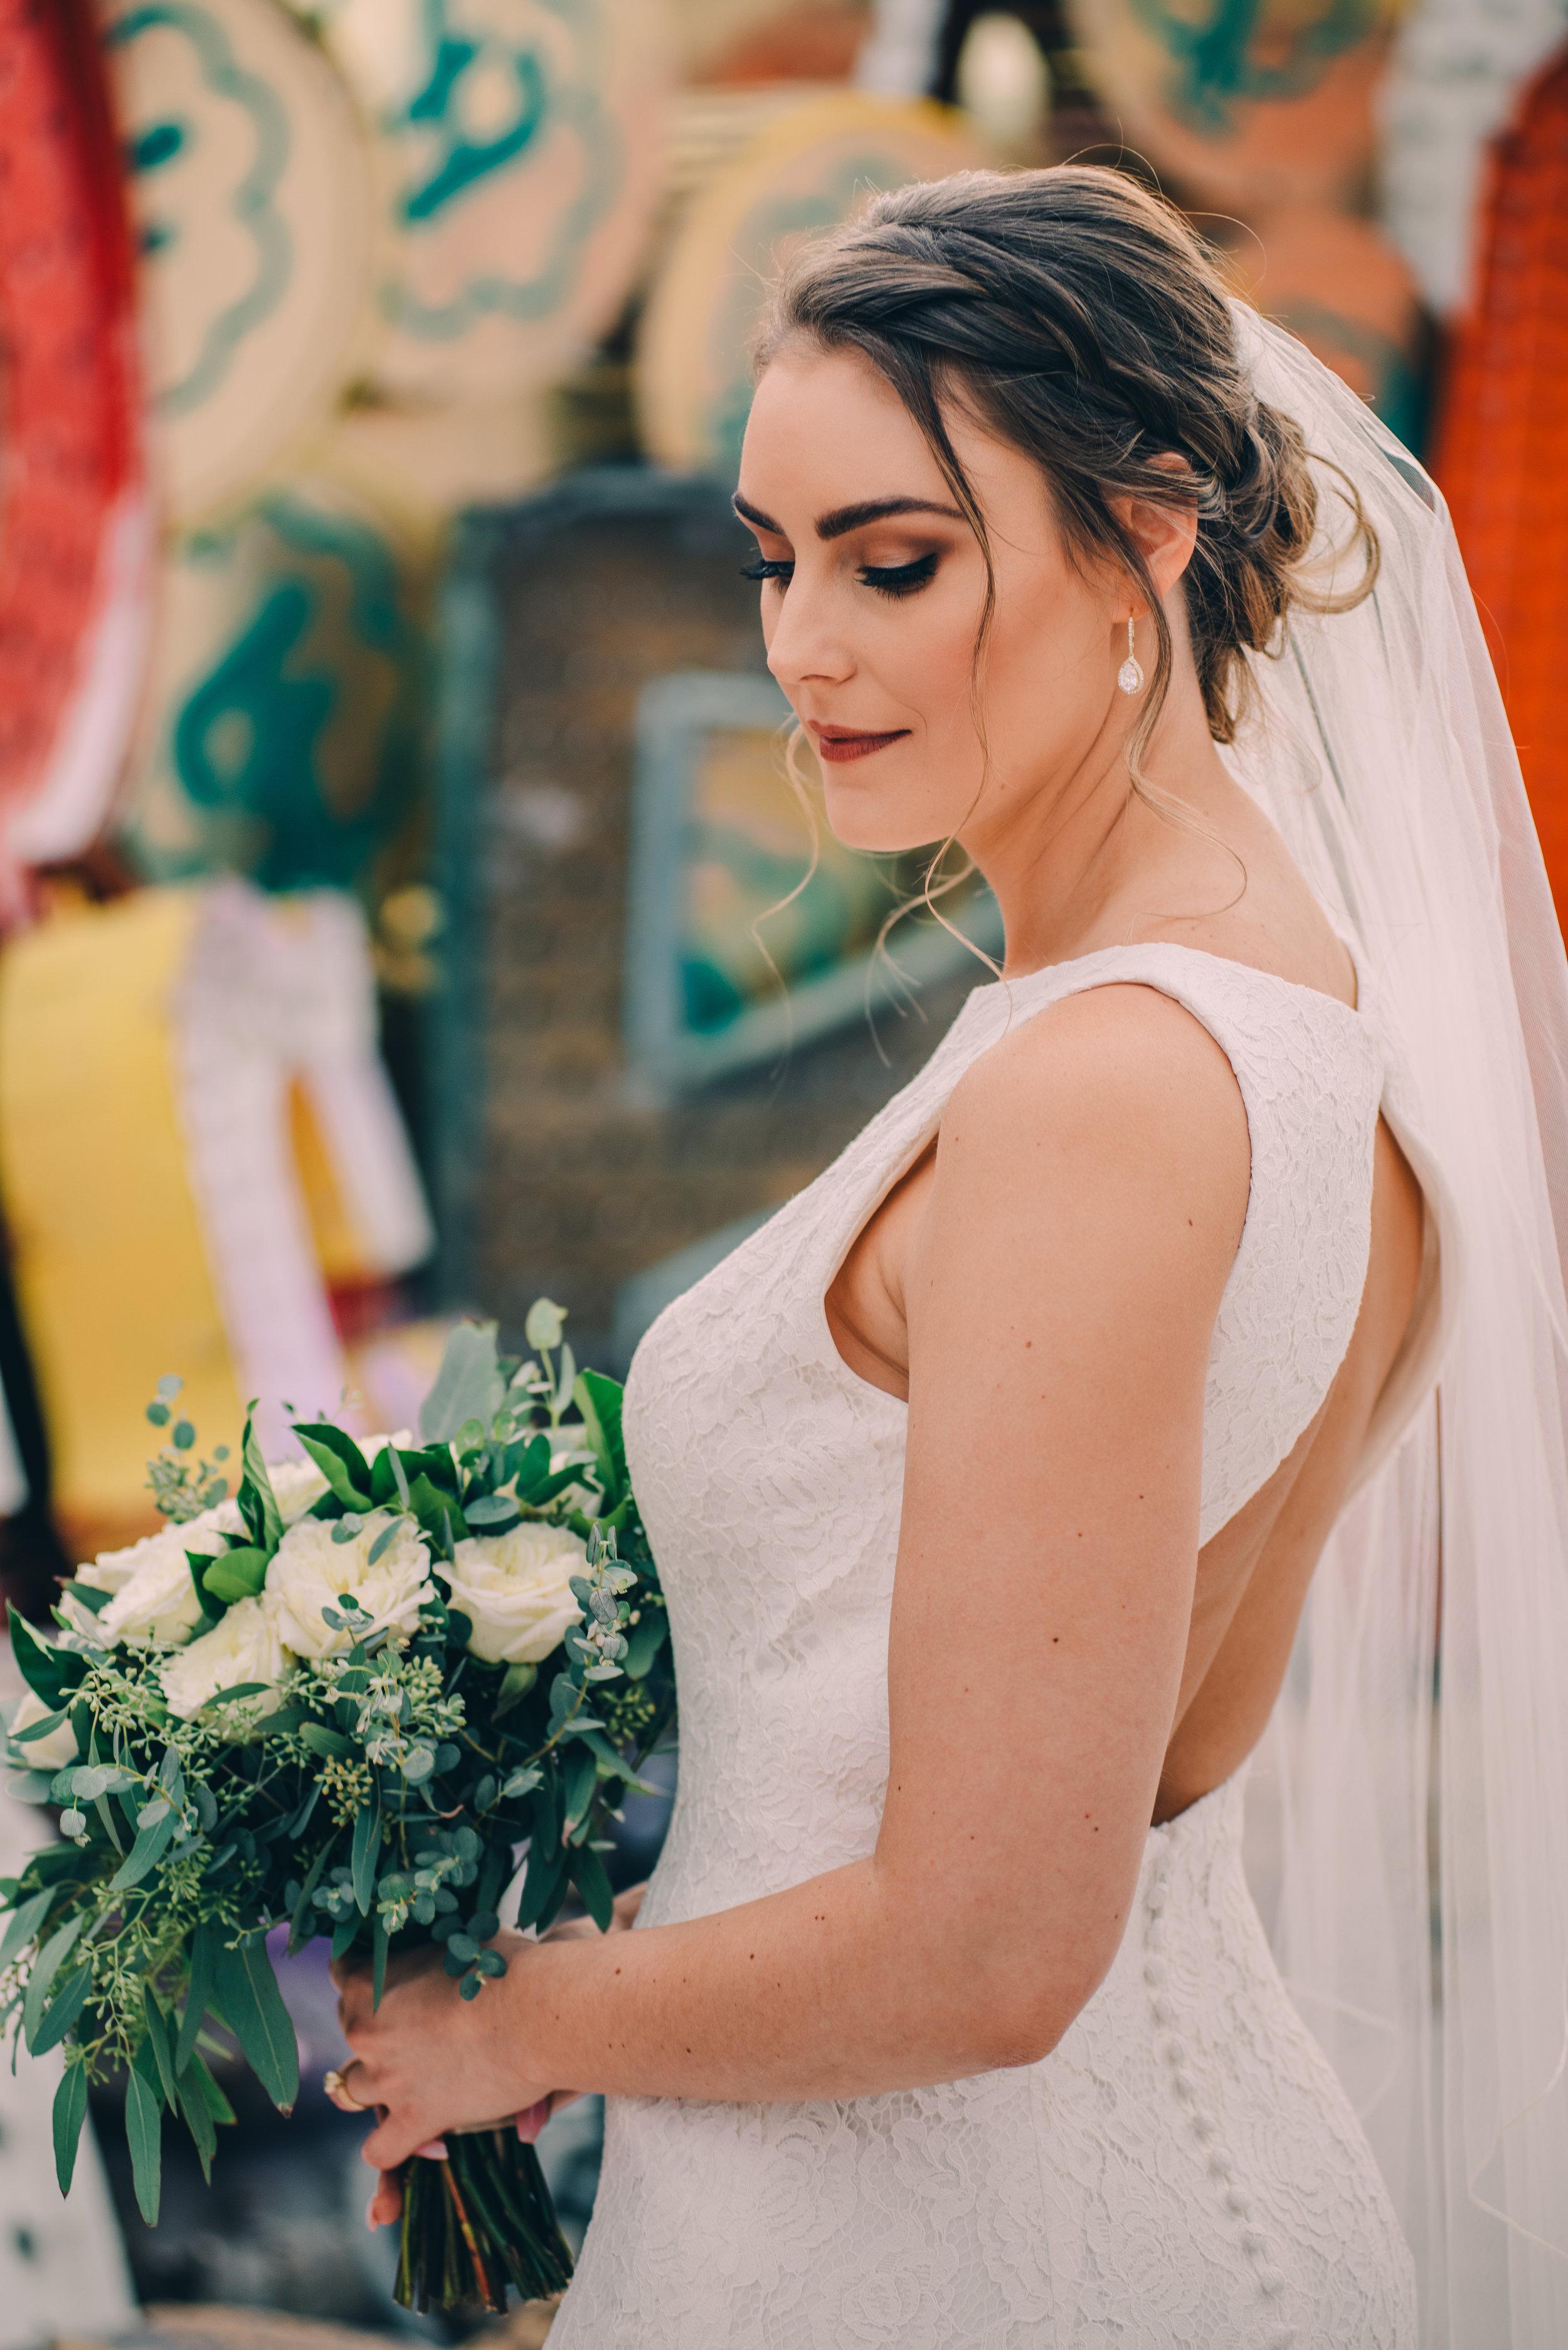 Modern Chic wedding makeup